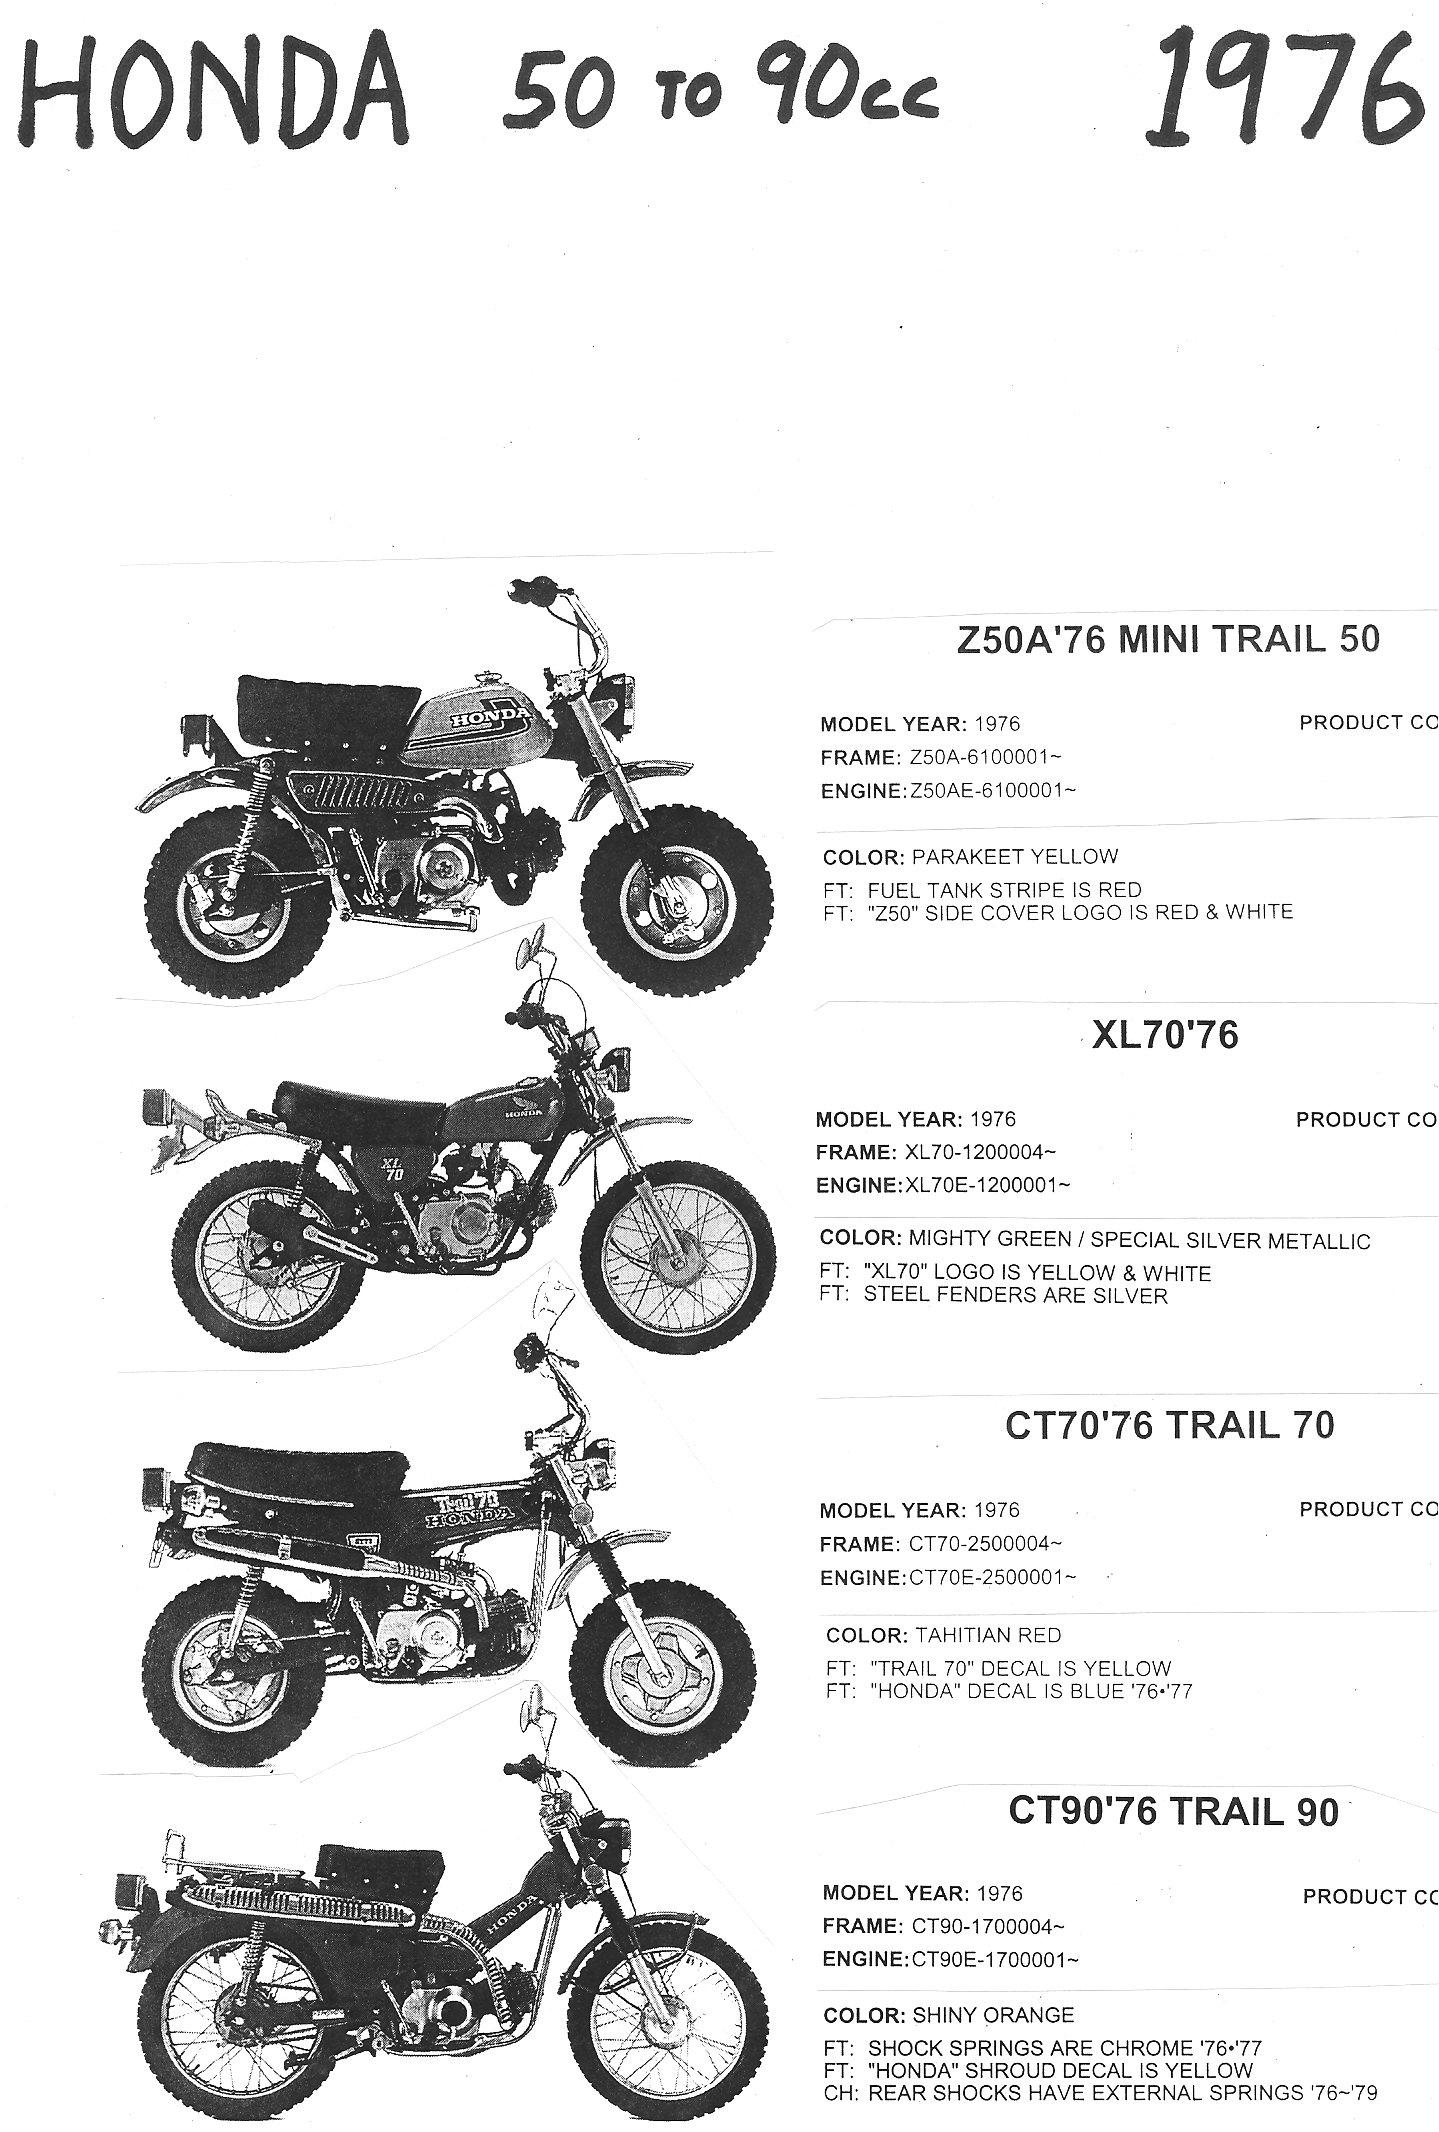 hight resolution of honda ct 70 k3 clutch assembly diagram wiring diagram furthermore 1974 honda ct70 trail 70 on honda ct 70 engine diagram